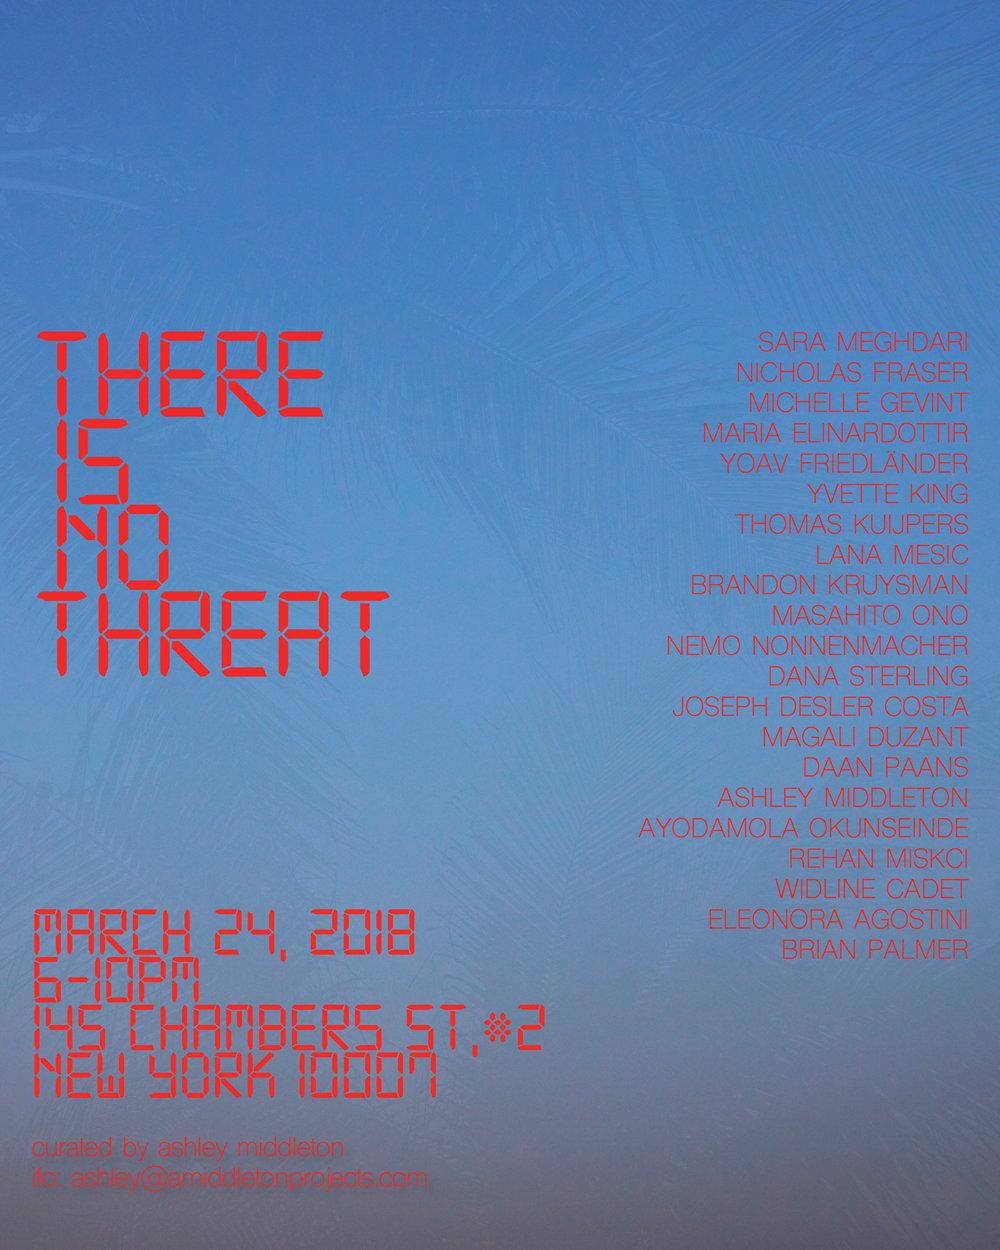 ThereIsNoThreat_Poster.jpg